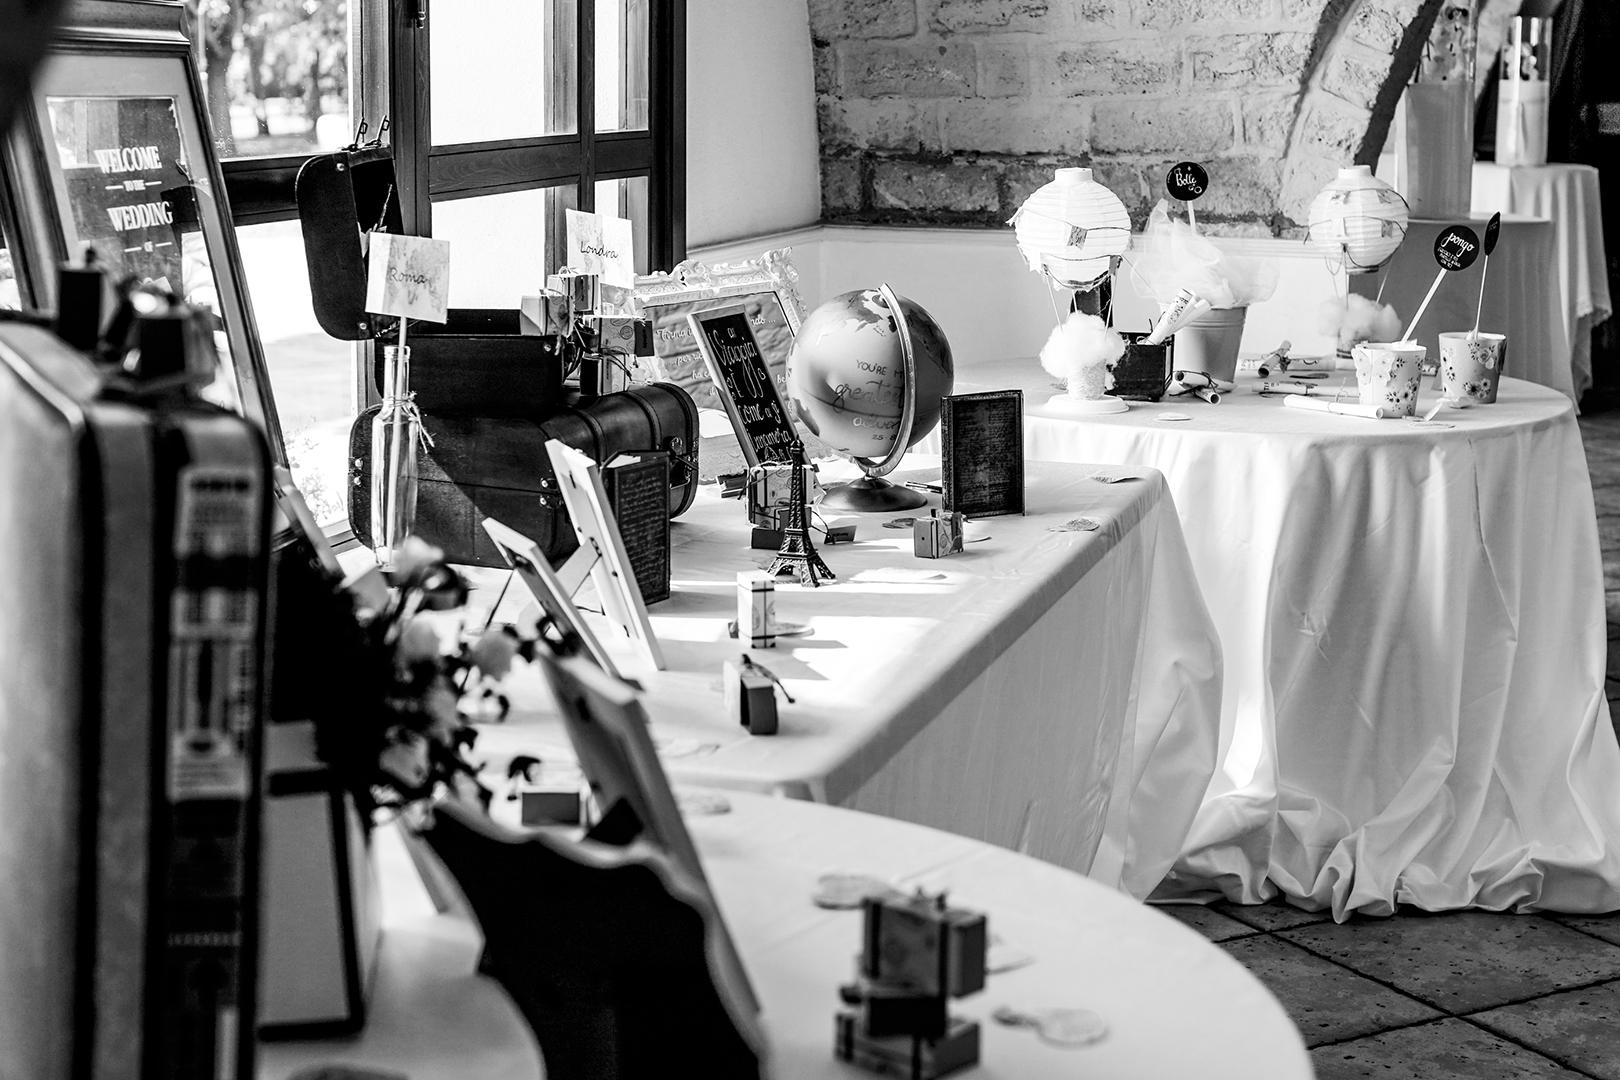 48 gianni-lepore-weddingday-torre-andriana-foggia-sala-ricevimento-dettagli-tema-viaggio